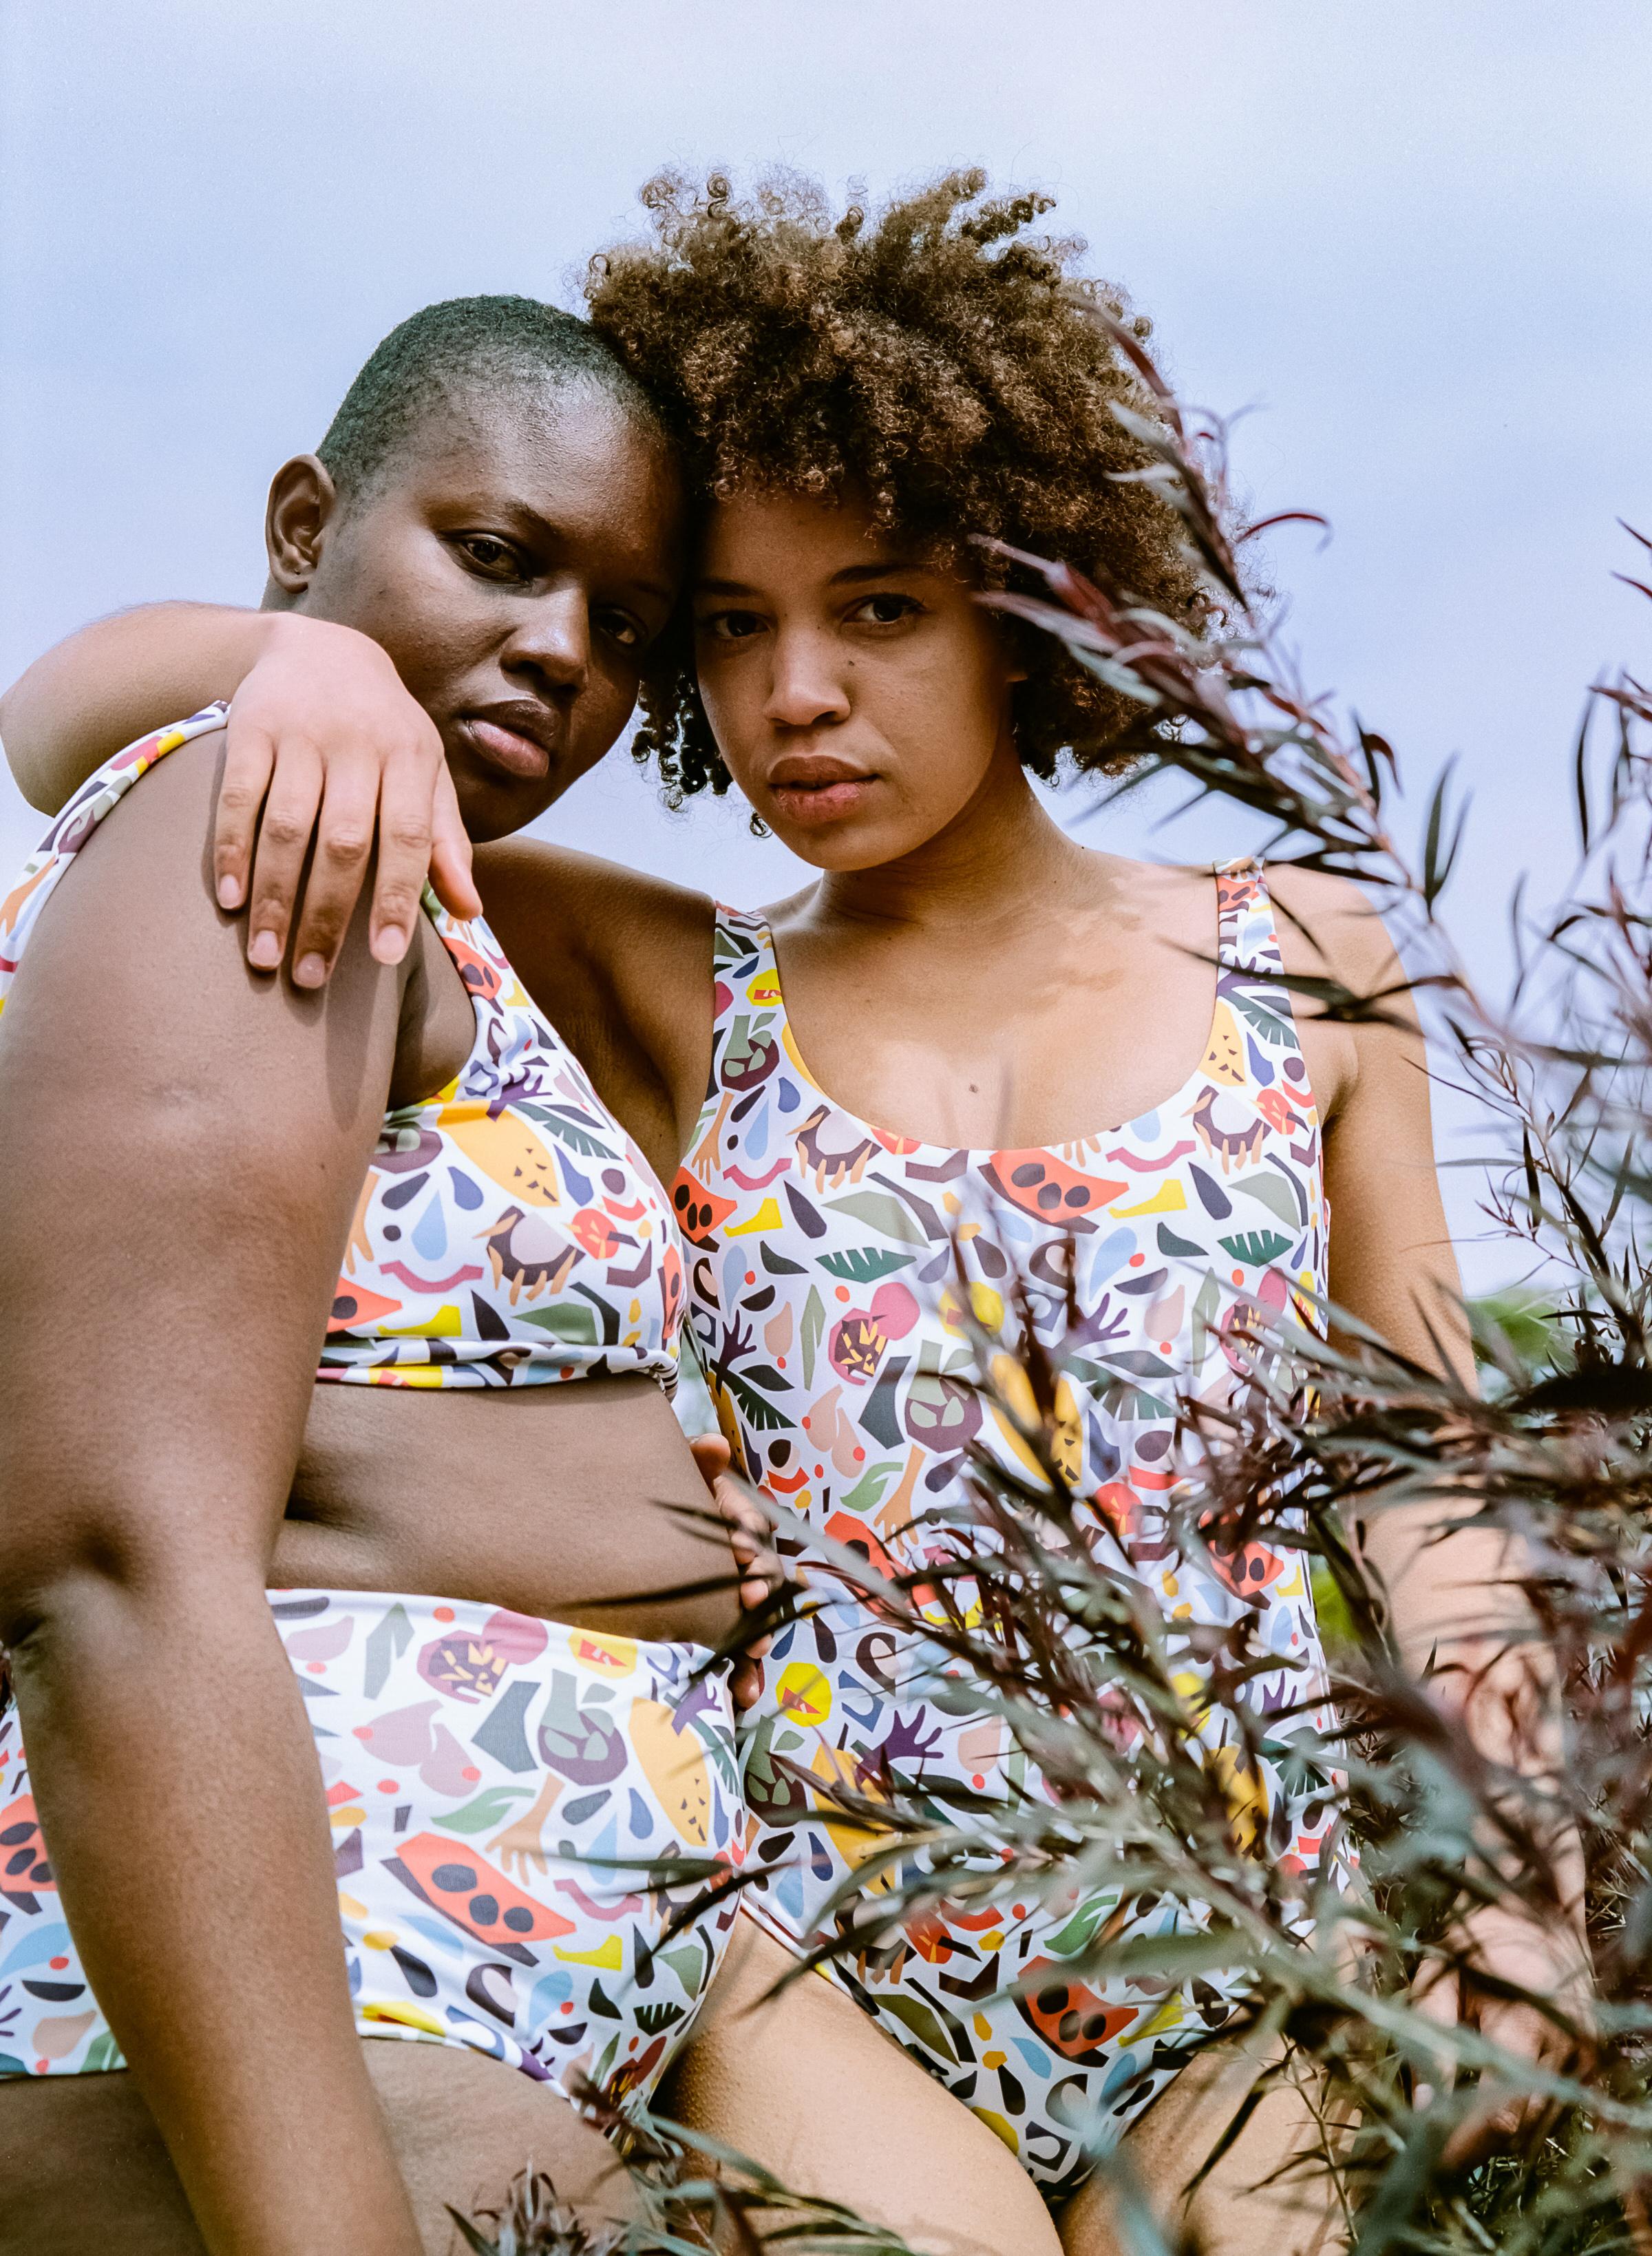 Nadia Hernández + Camp Cove Swim print collaboration.